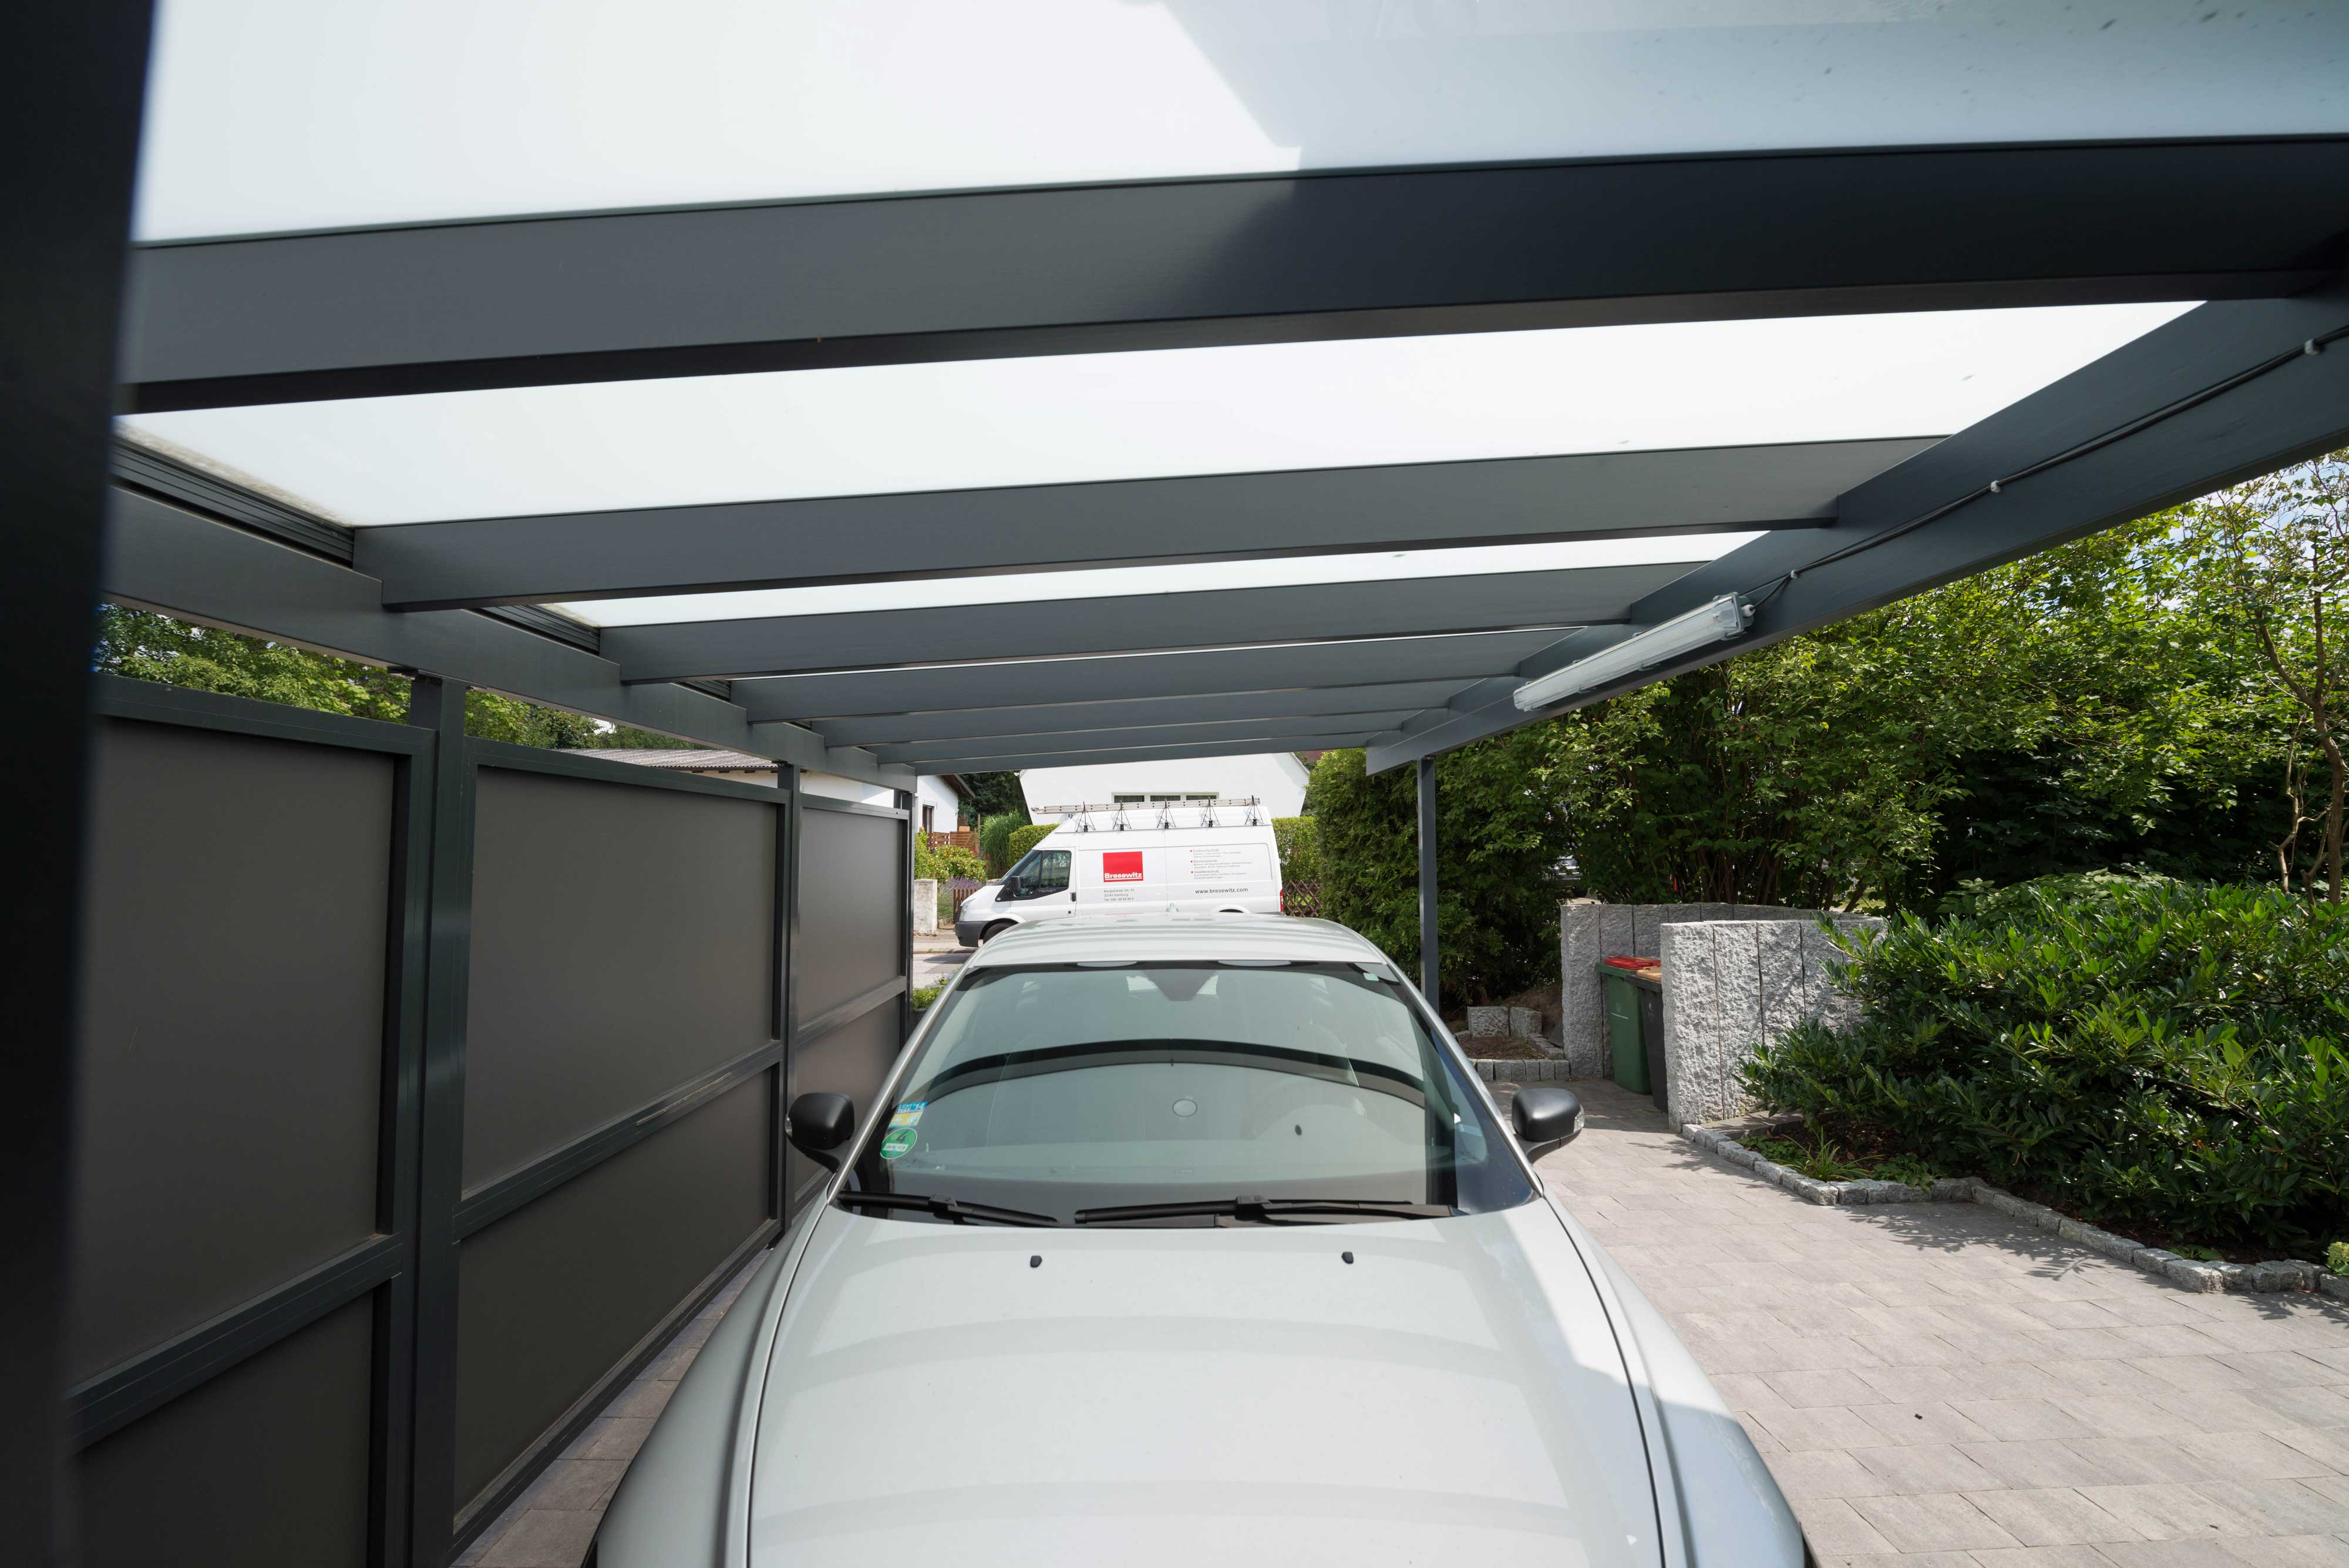 glasdach carport in hamburg schulze braak. Black Bedroom Furniture Sets. Home Design Ideas